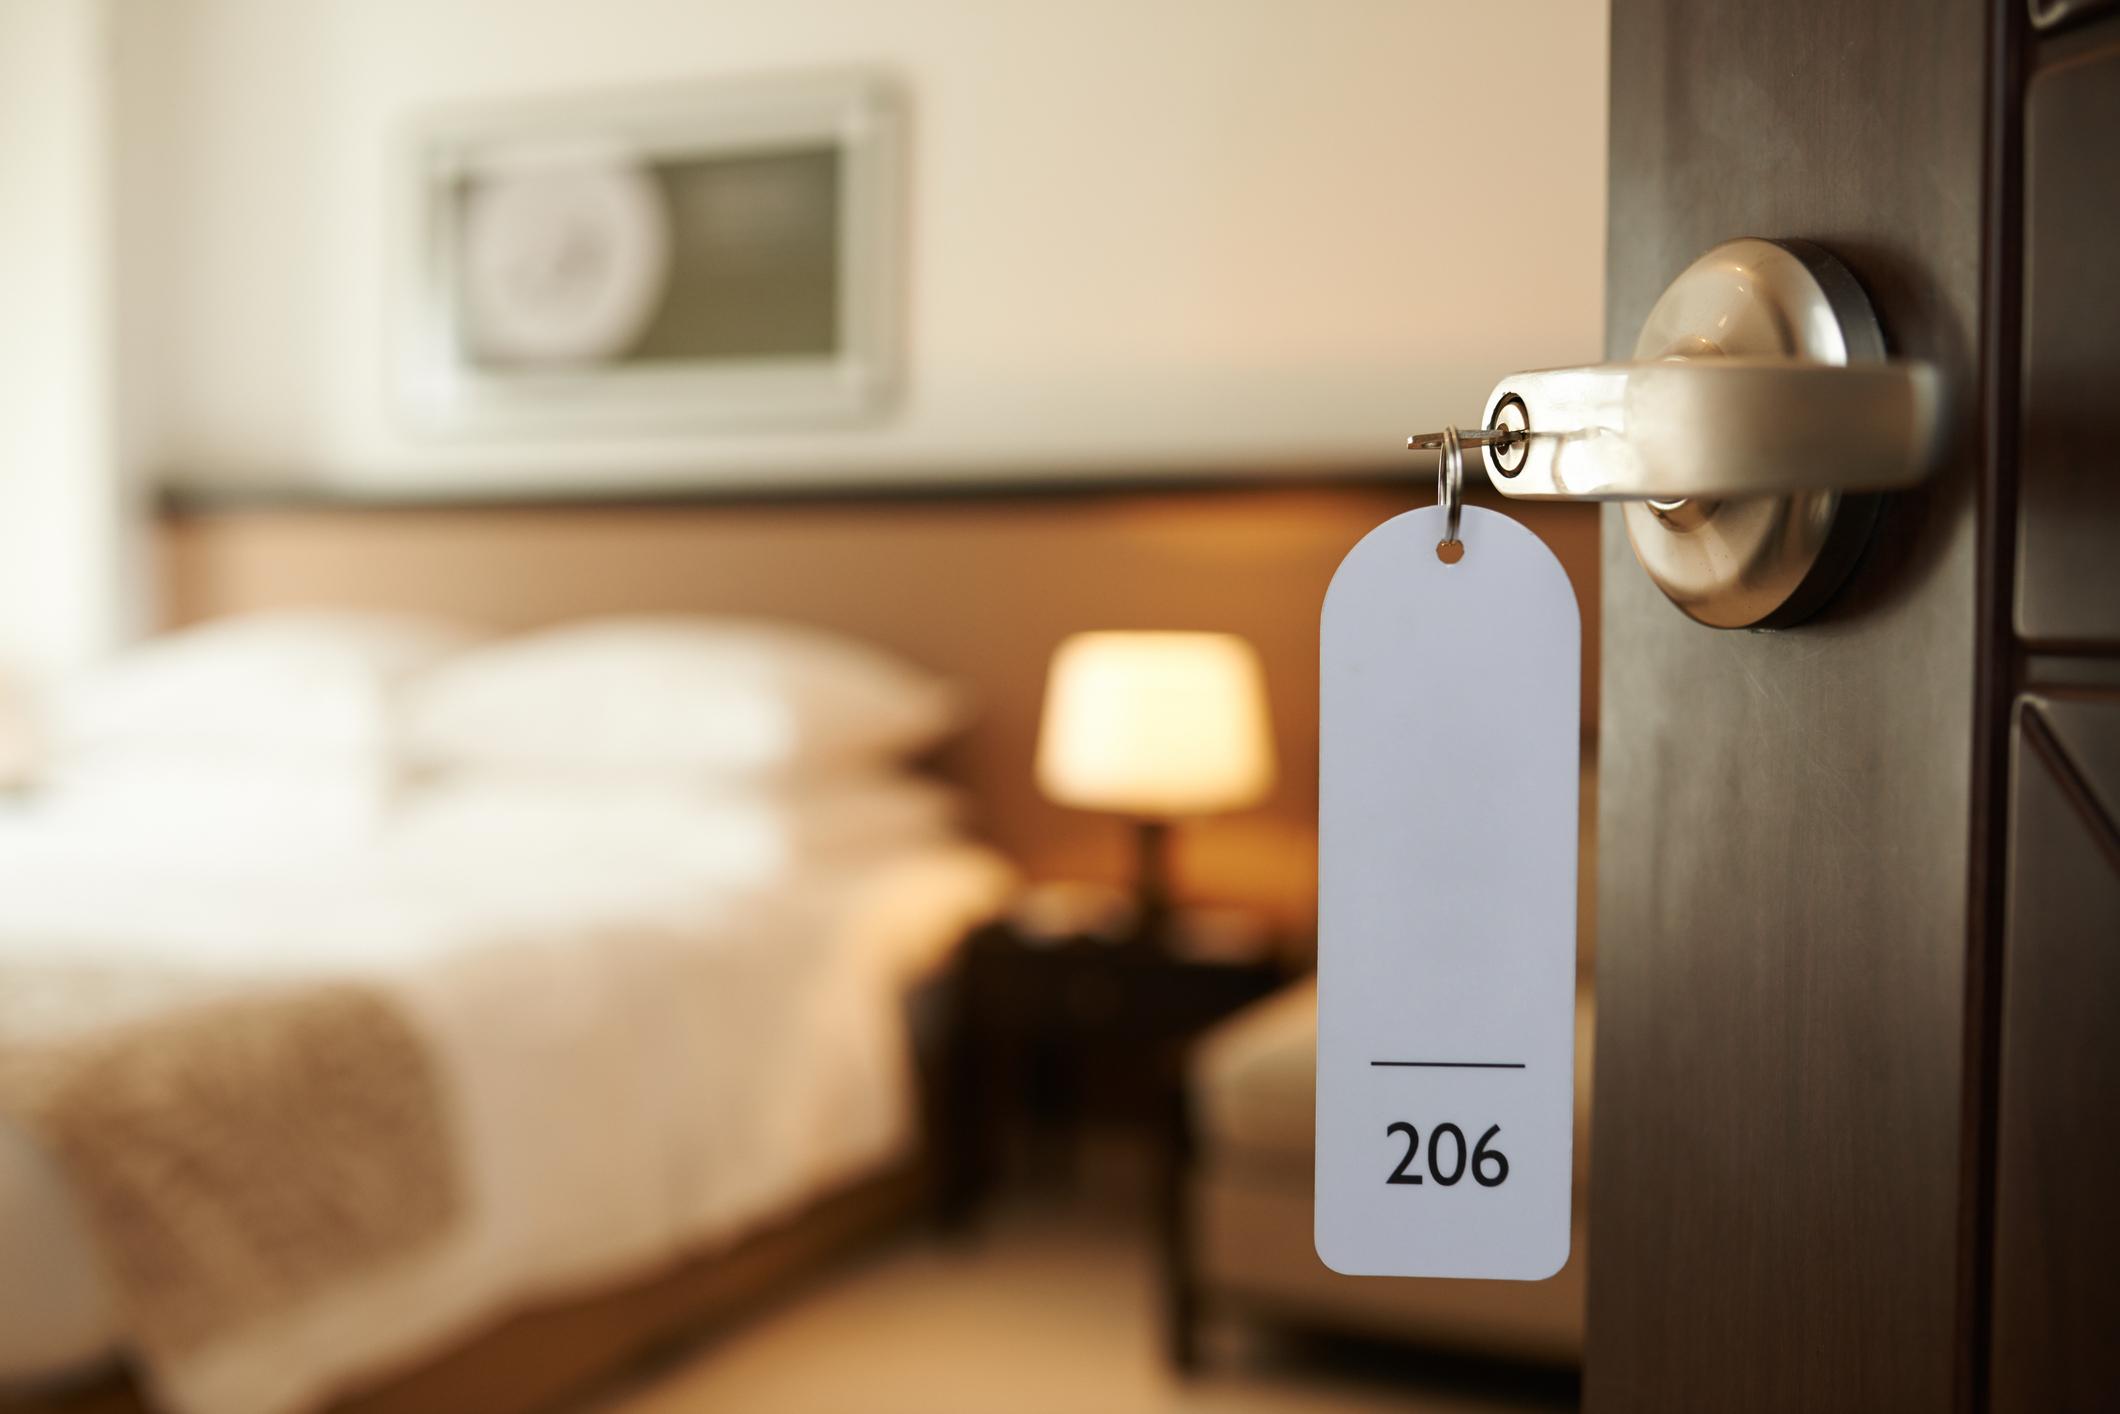 Hotel room with door open and key in the lock.